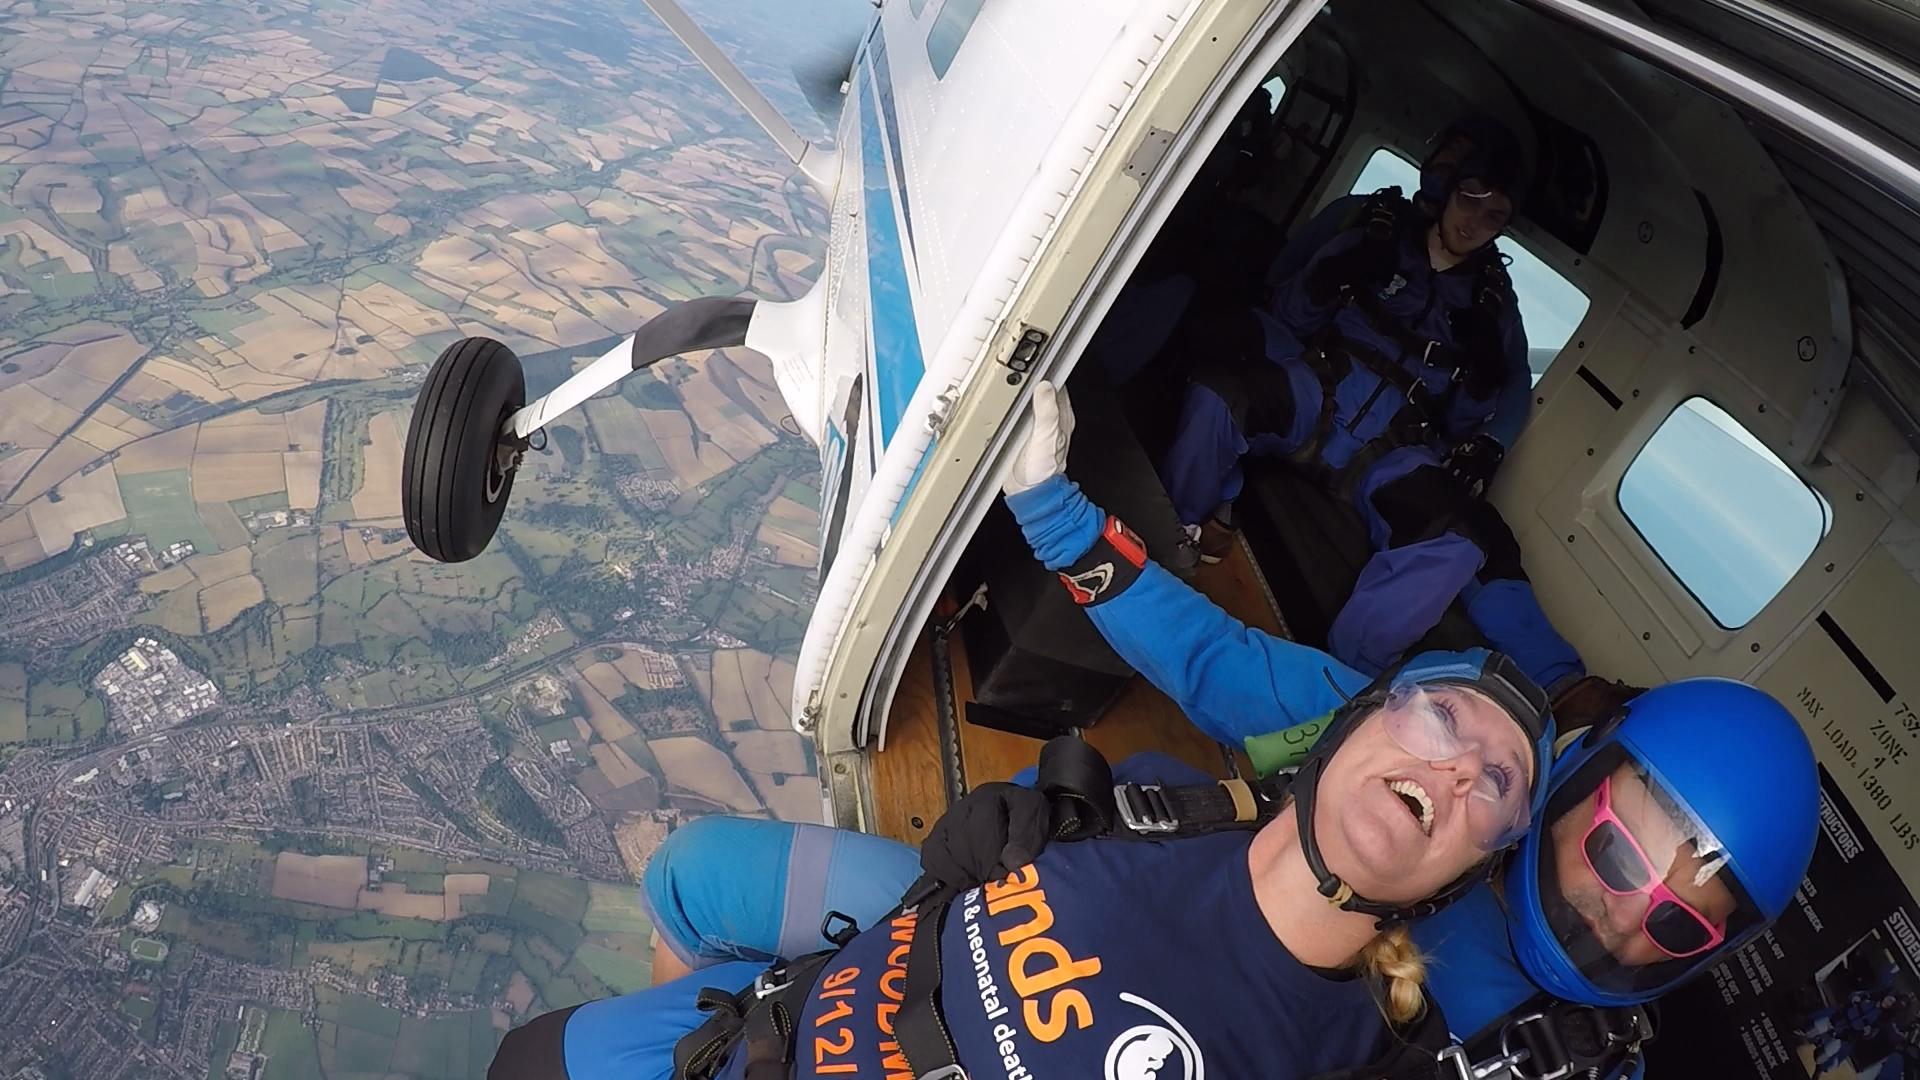 Samantha-Bail-Darren-Bail-and-Aimee-Faulkner-took-part-in-a-skydive-5-002